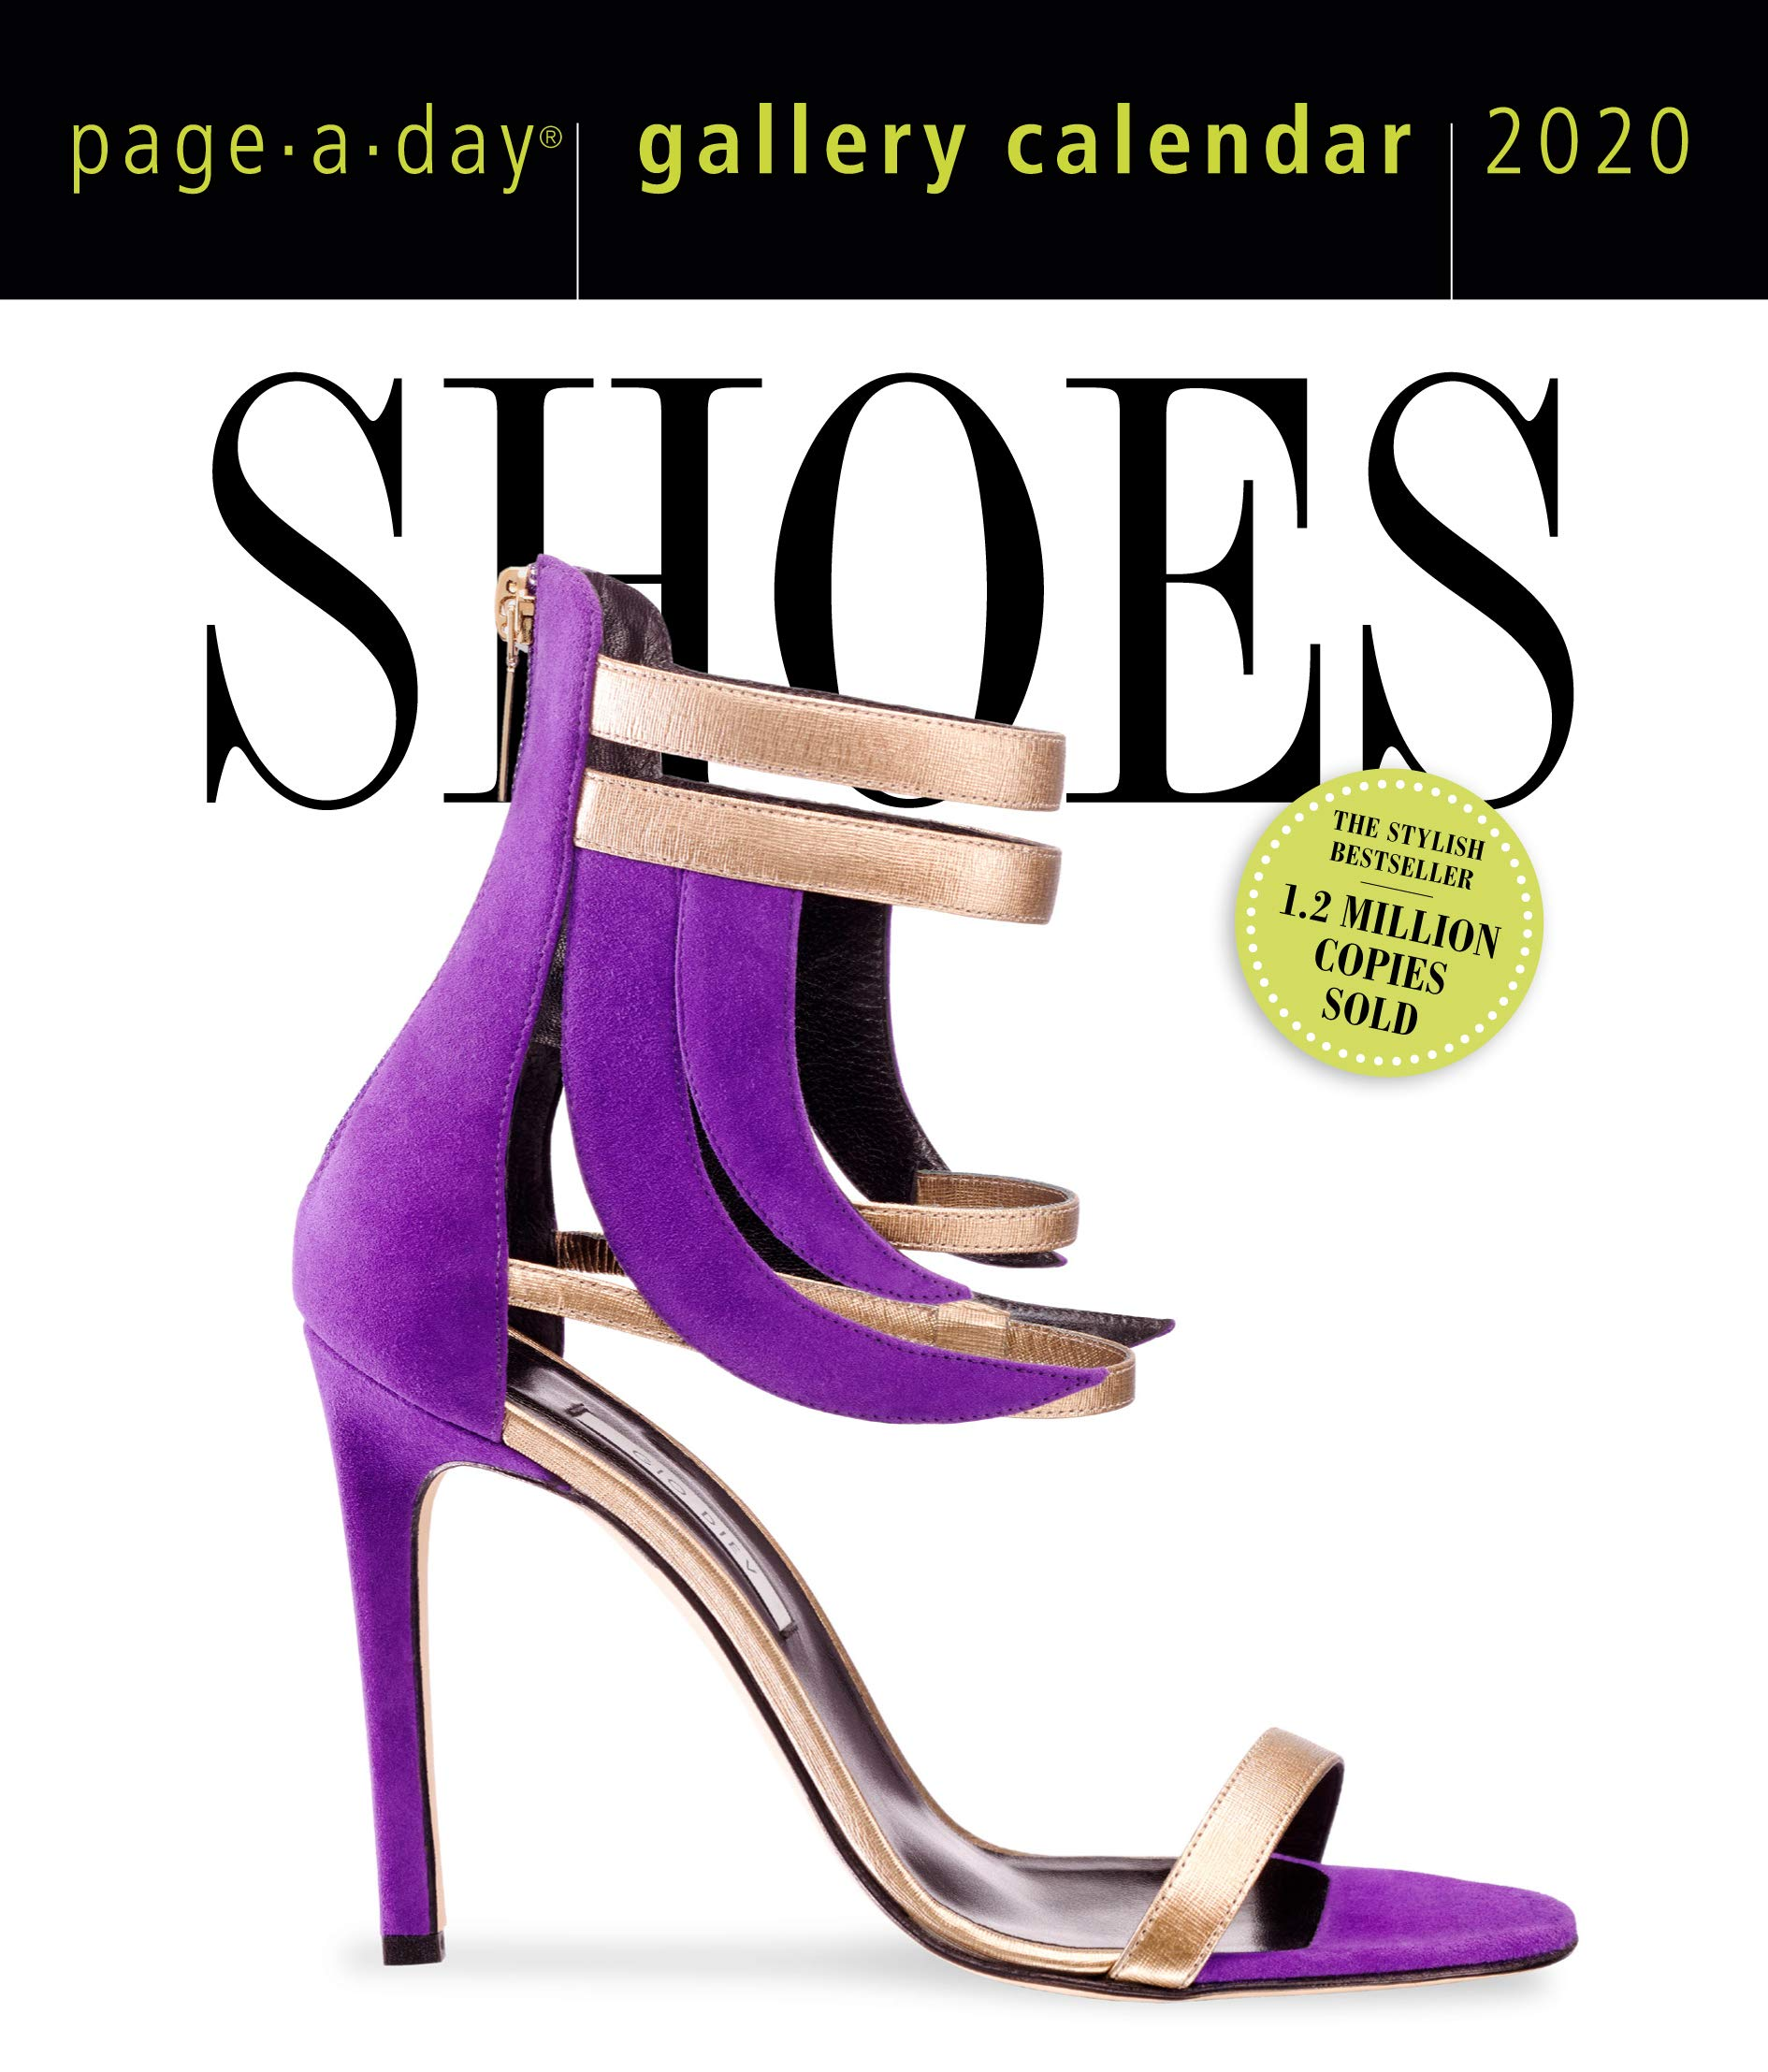 Shoe Release Calendar 2020 Shoes Page A Day Gallery Calendar 2020: Workman Publishing